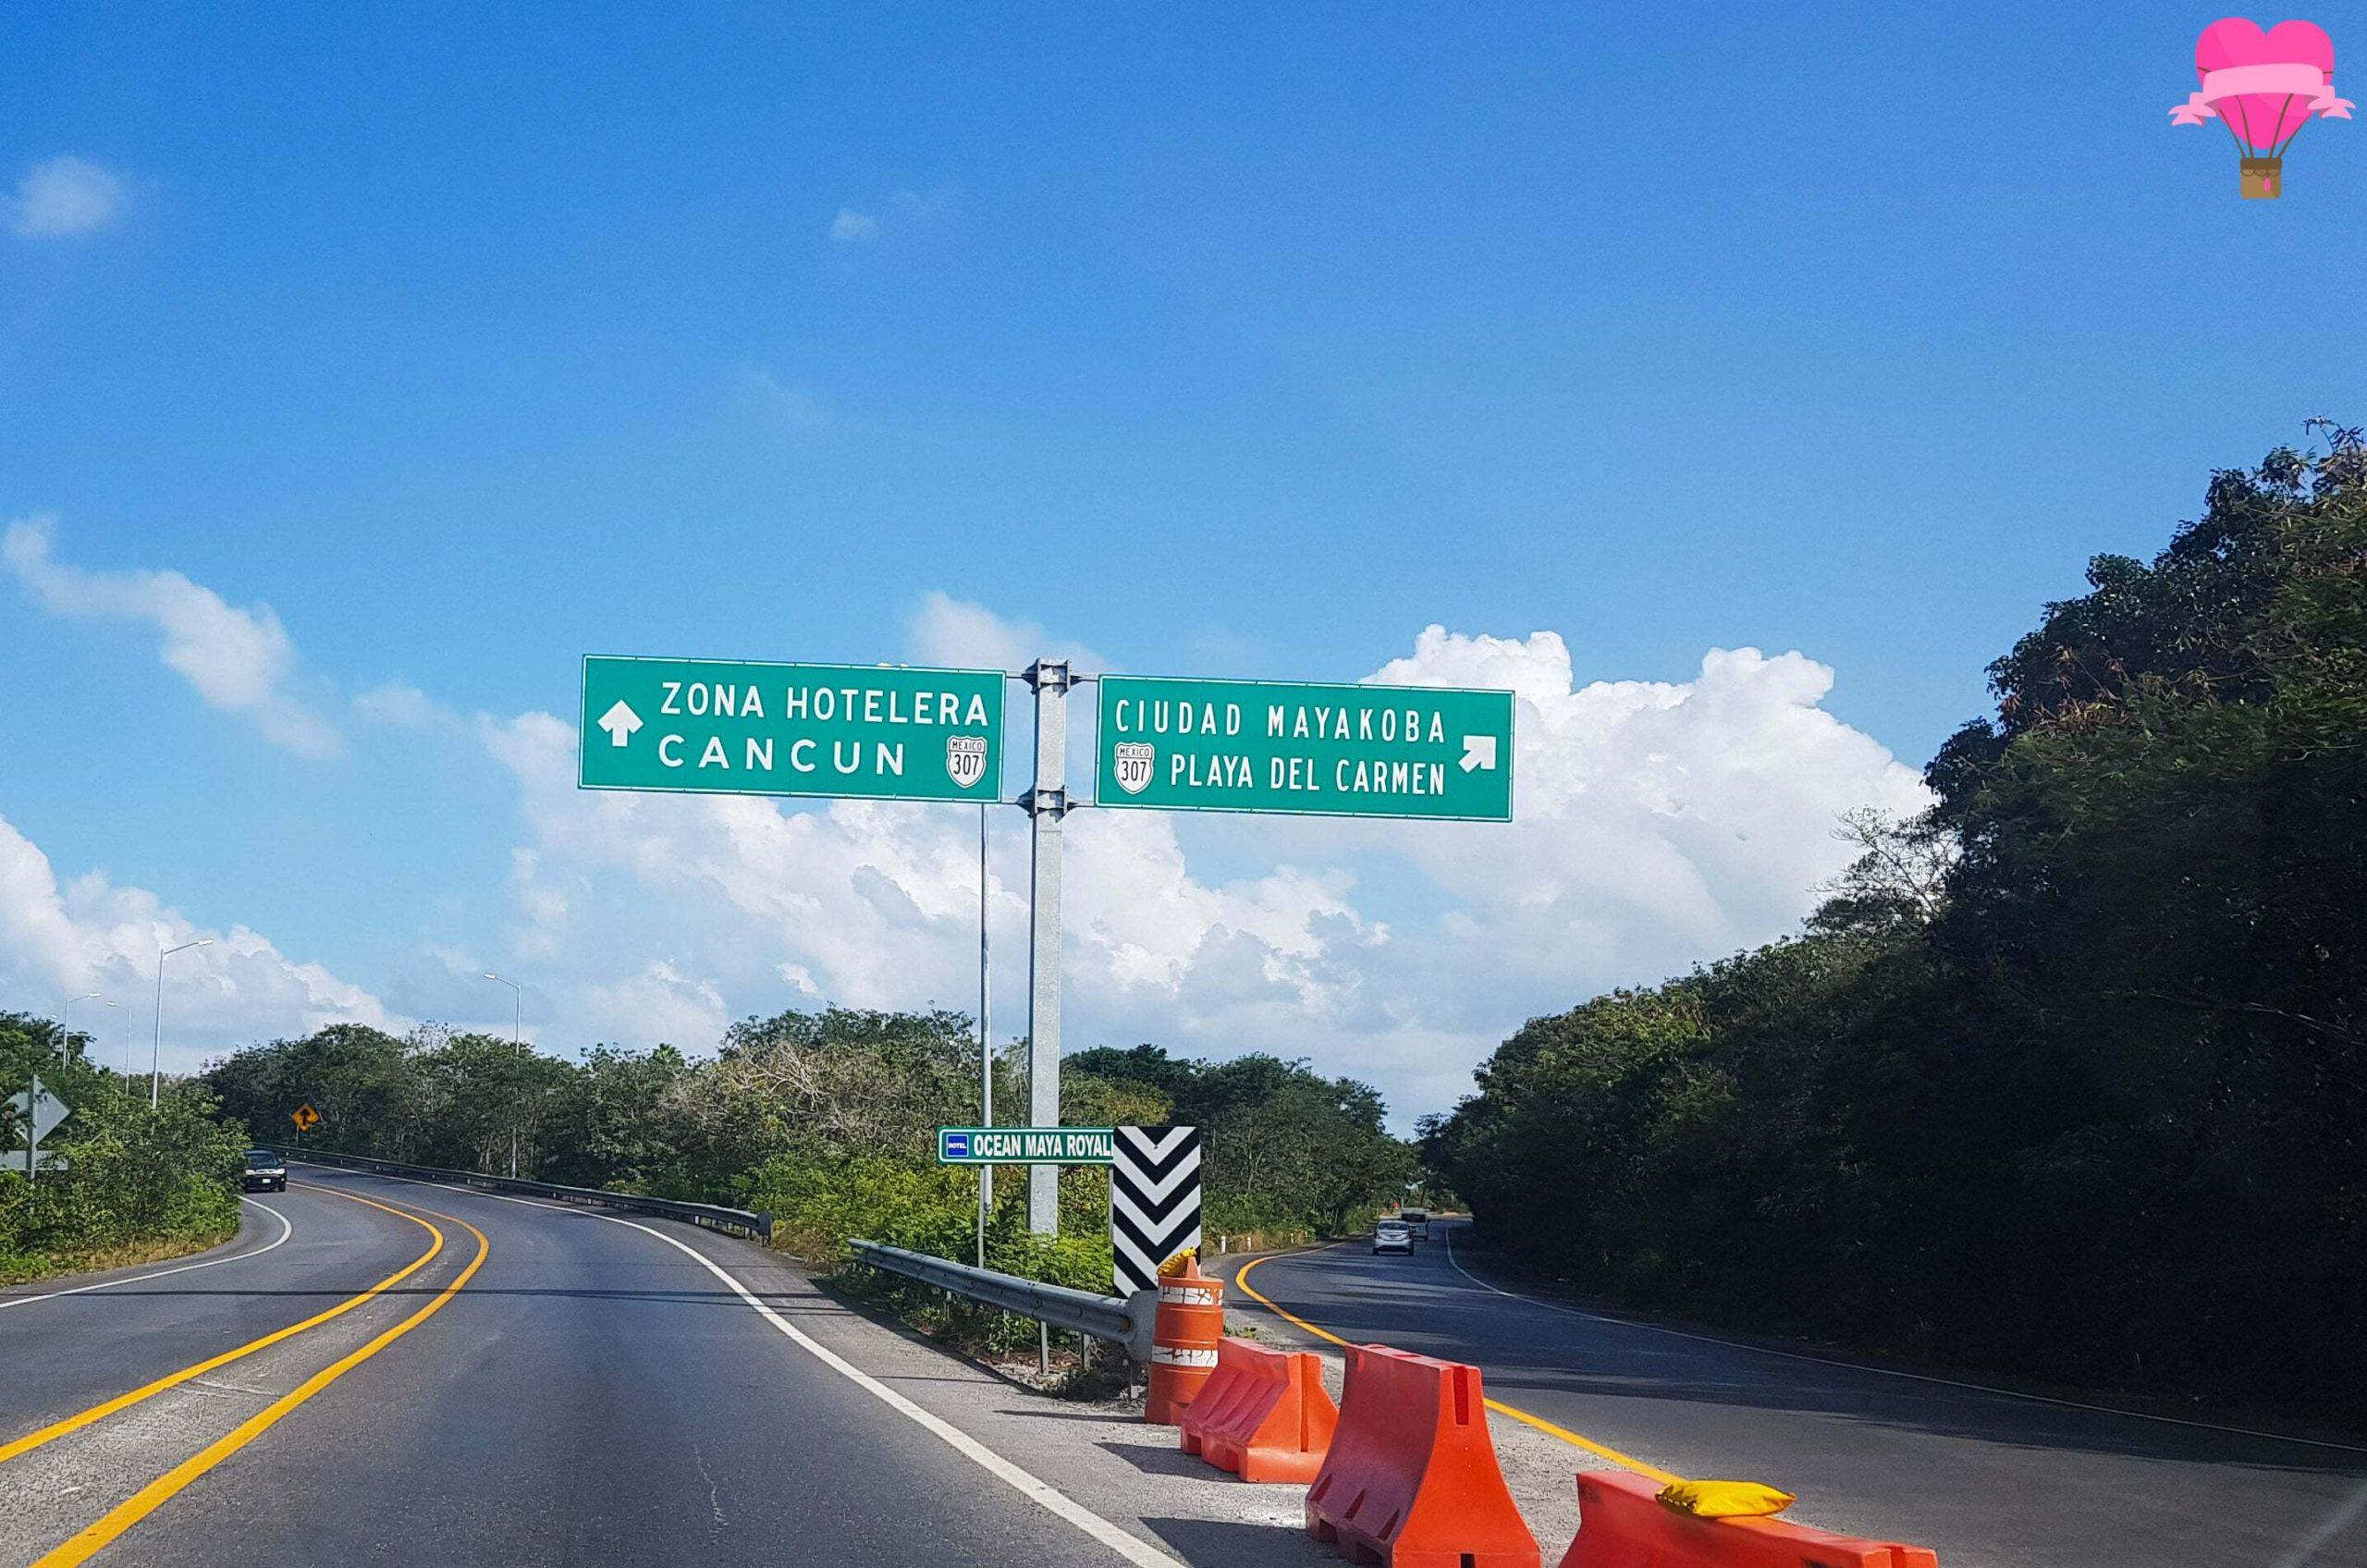 aluguel-carro-cancun-mexico-alamo